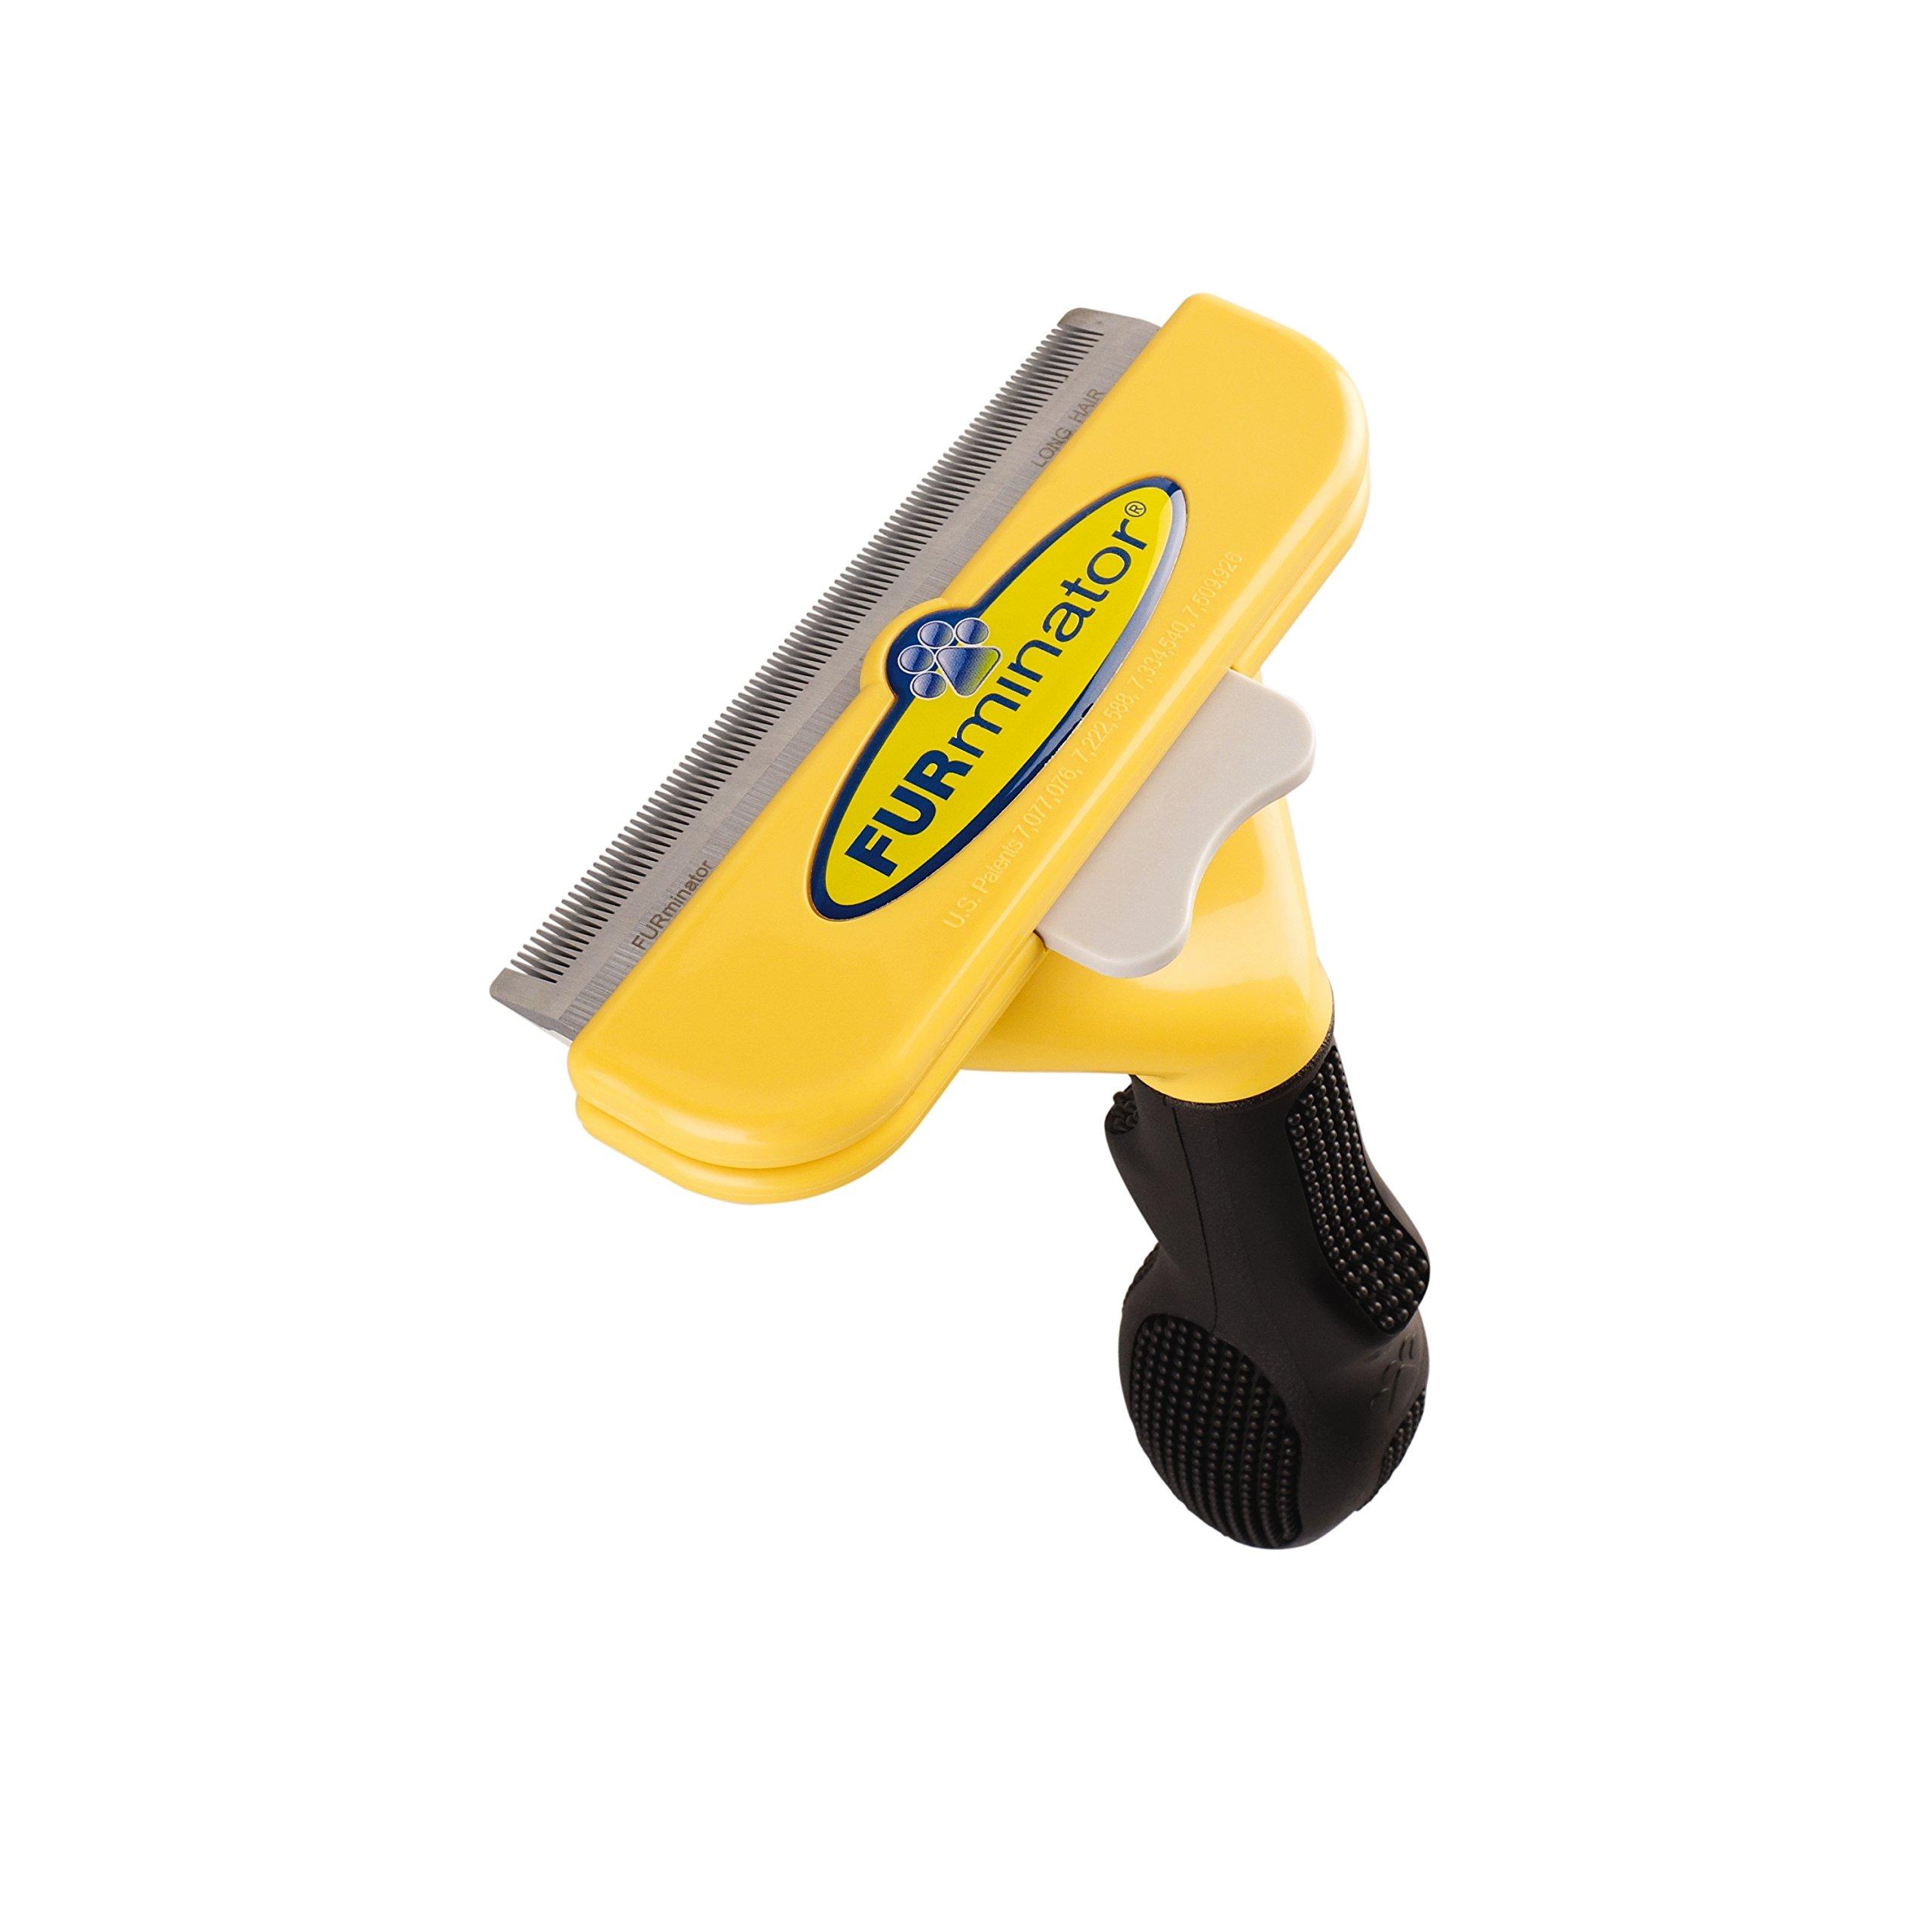 FURminator deShedding Tool for Dogs product image